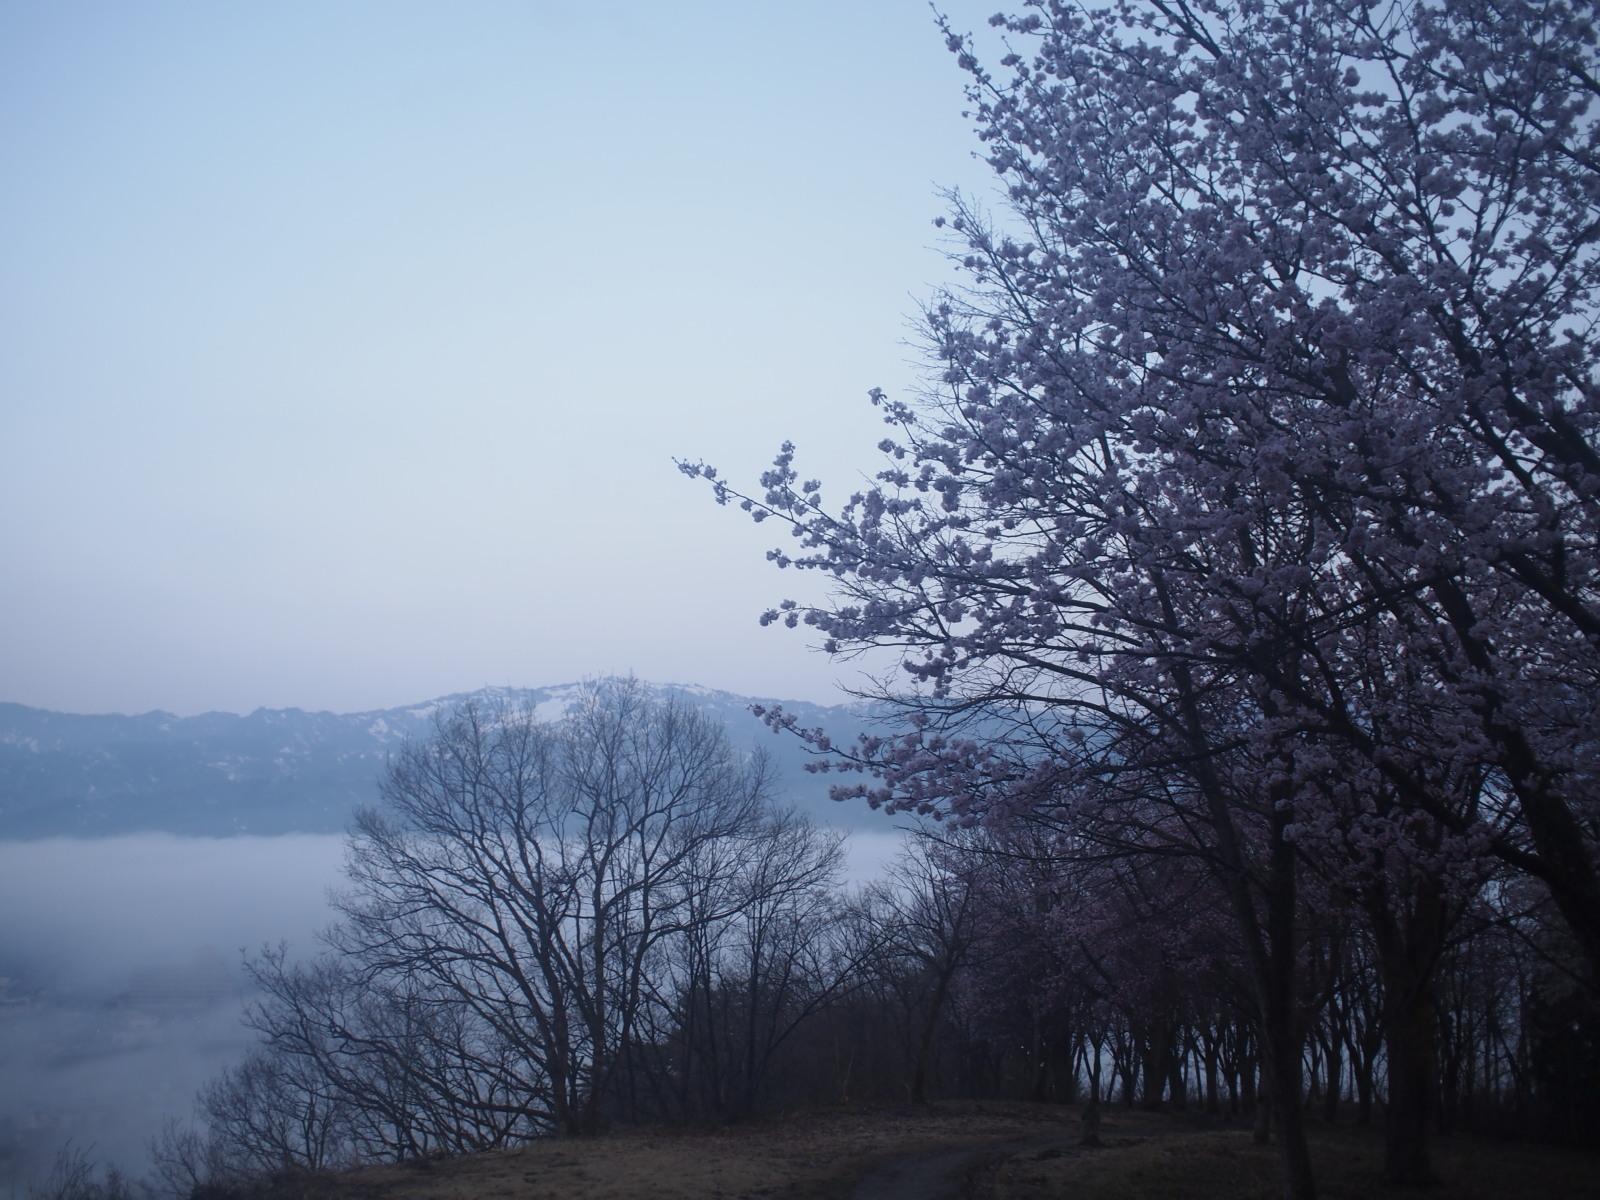 2018.4.10 tue. 春の花と夜明け前の雲海 BY HUNTER-SHISHIMAI